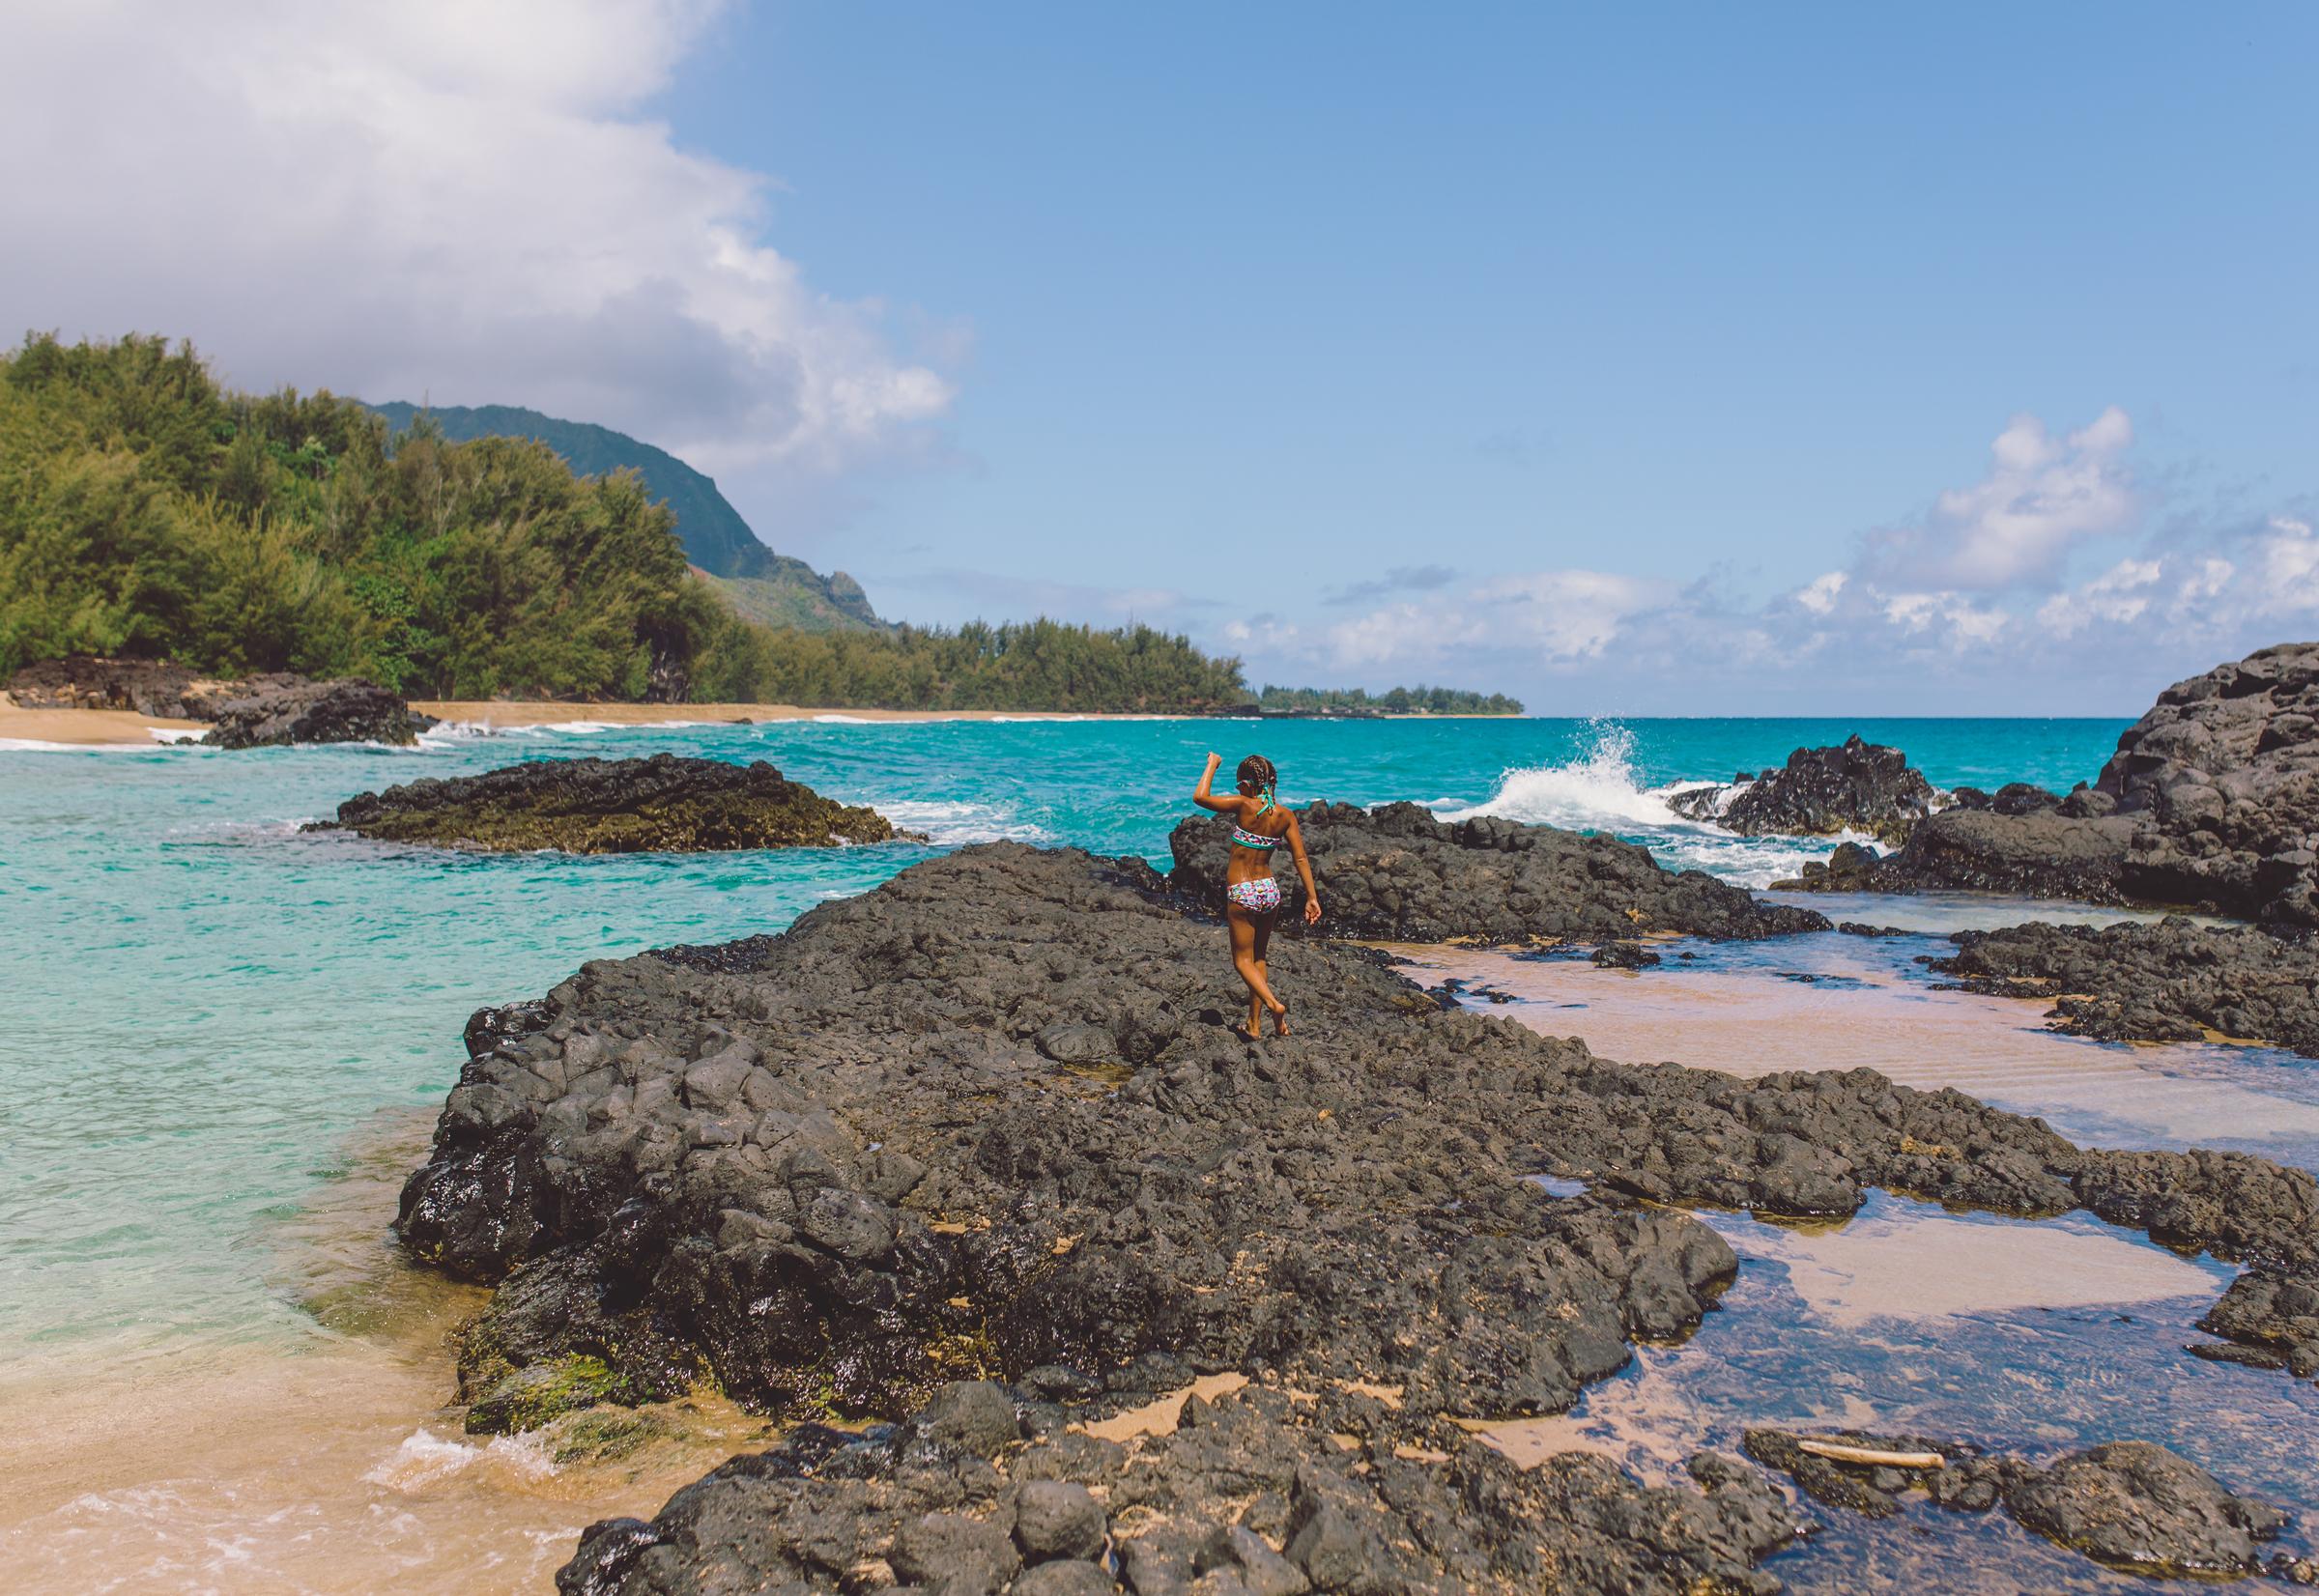 IMG_2465--KAUAI-HAWAII-JENNIFER-PICARD-PHOTOGRAPHY.jpg